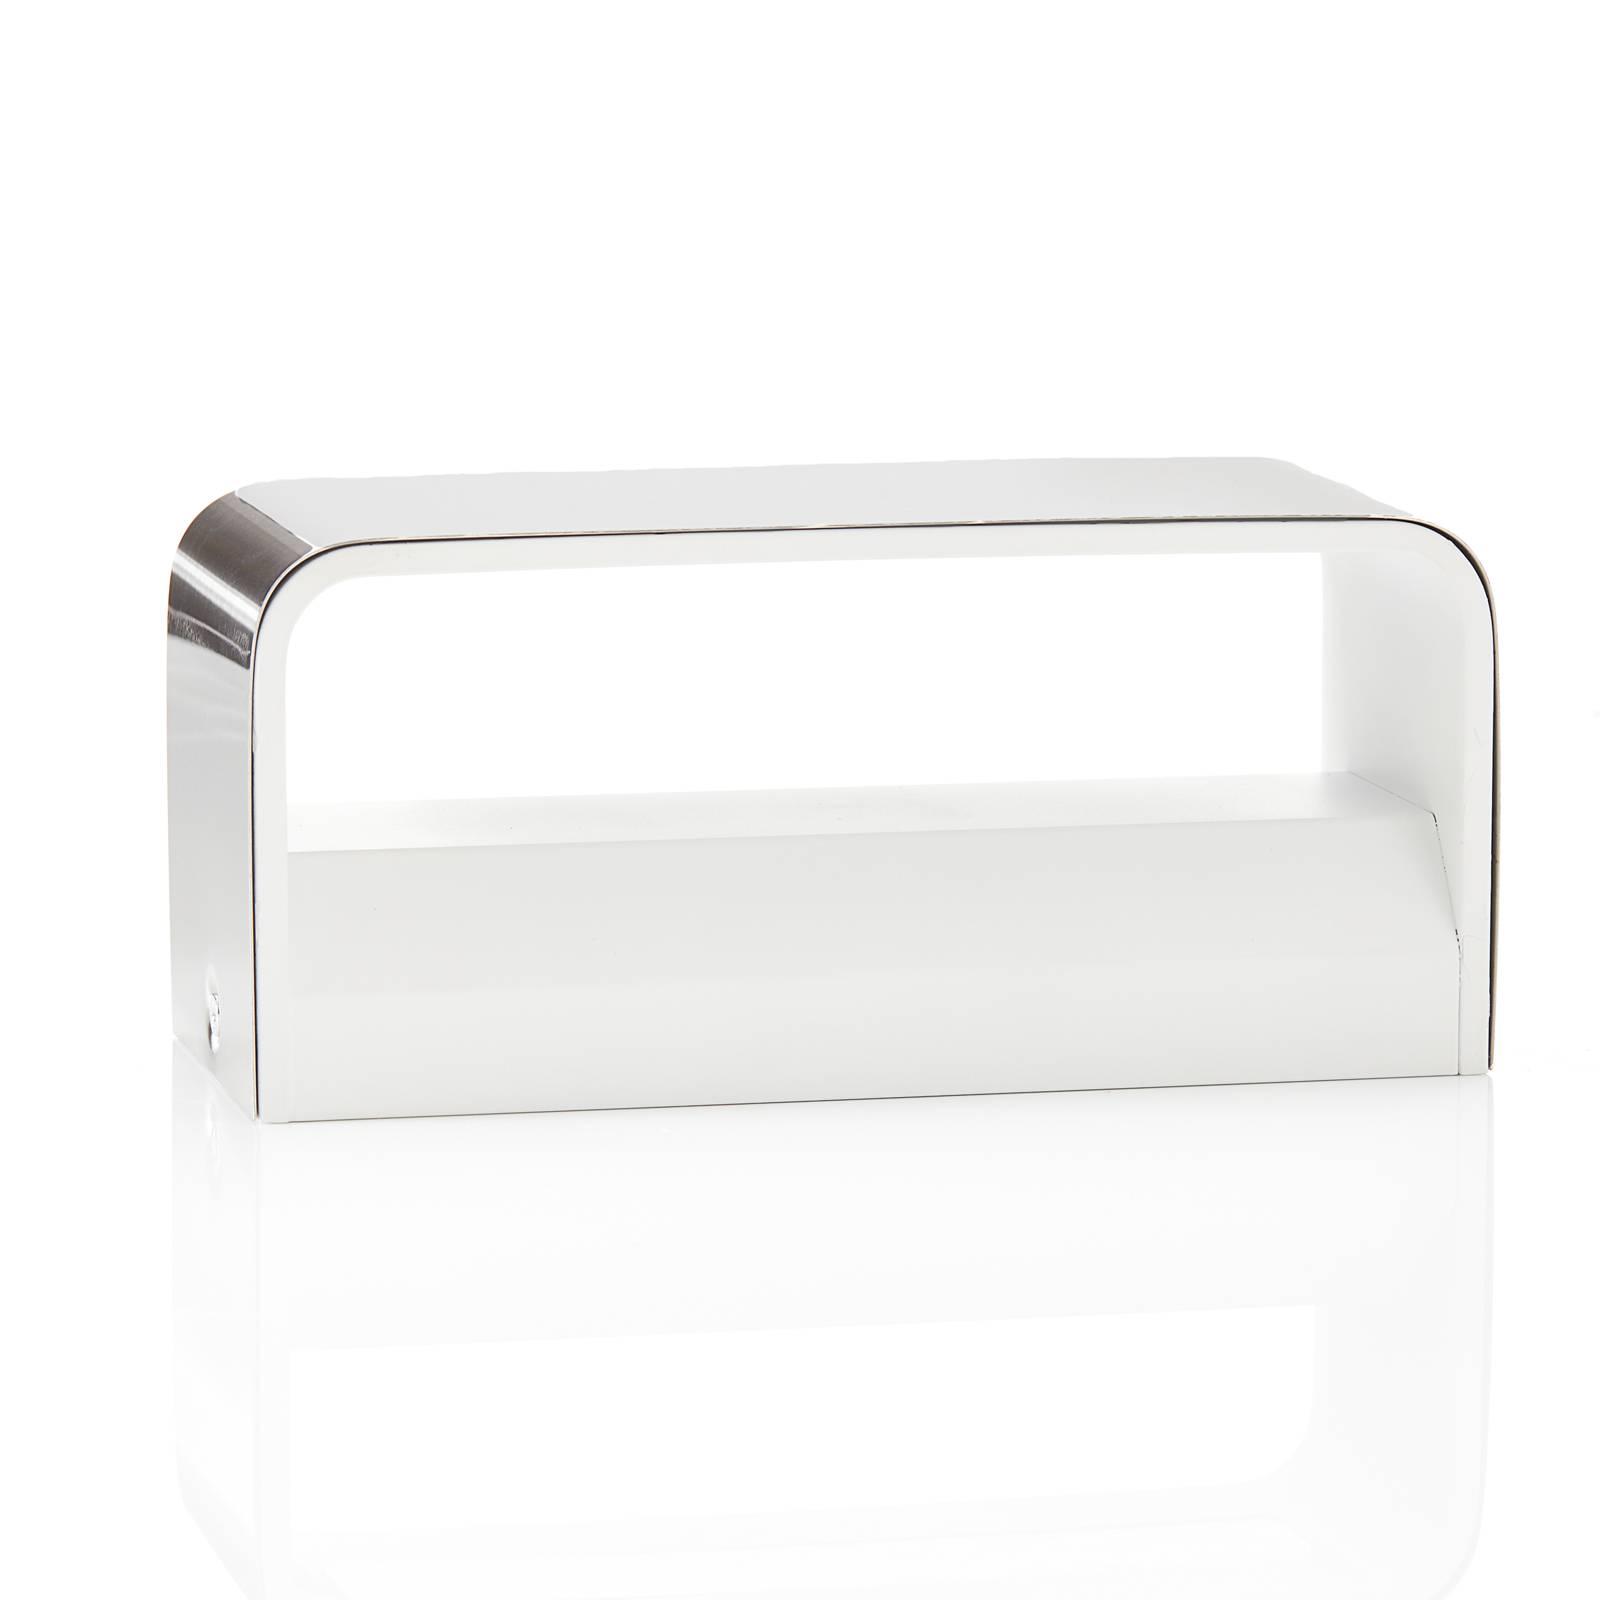 Lucande Sessa -LED-seinävalaisin 20 cm nikkeli